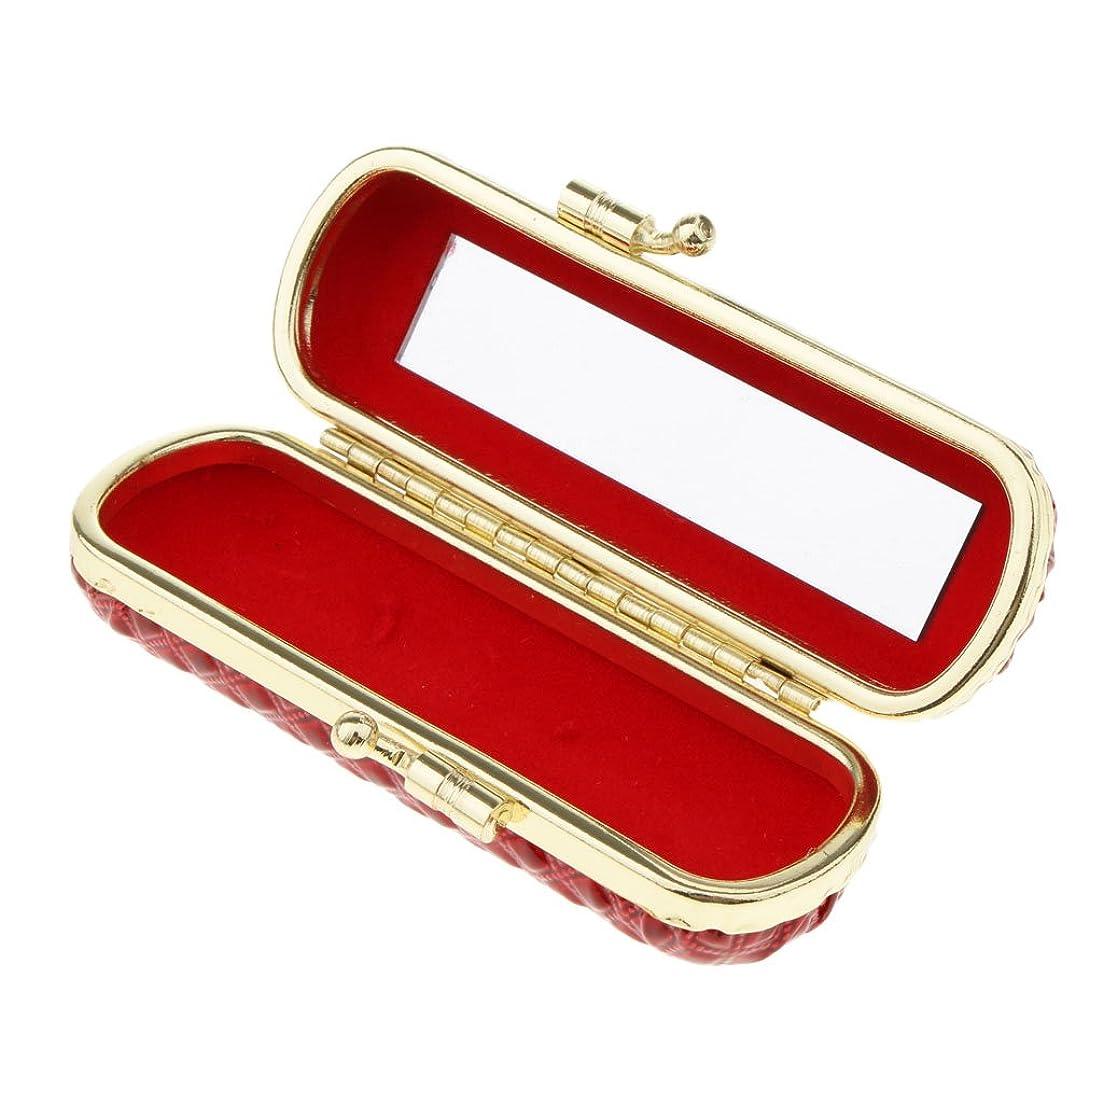 Perfk 口紅ケース リップスティックケース ミラー付き 香水 オイル 収納ケース 多色選択 - 赤